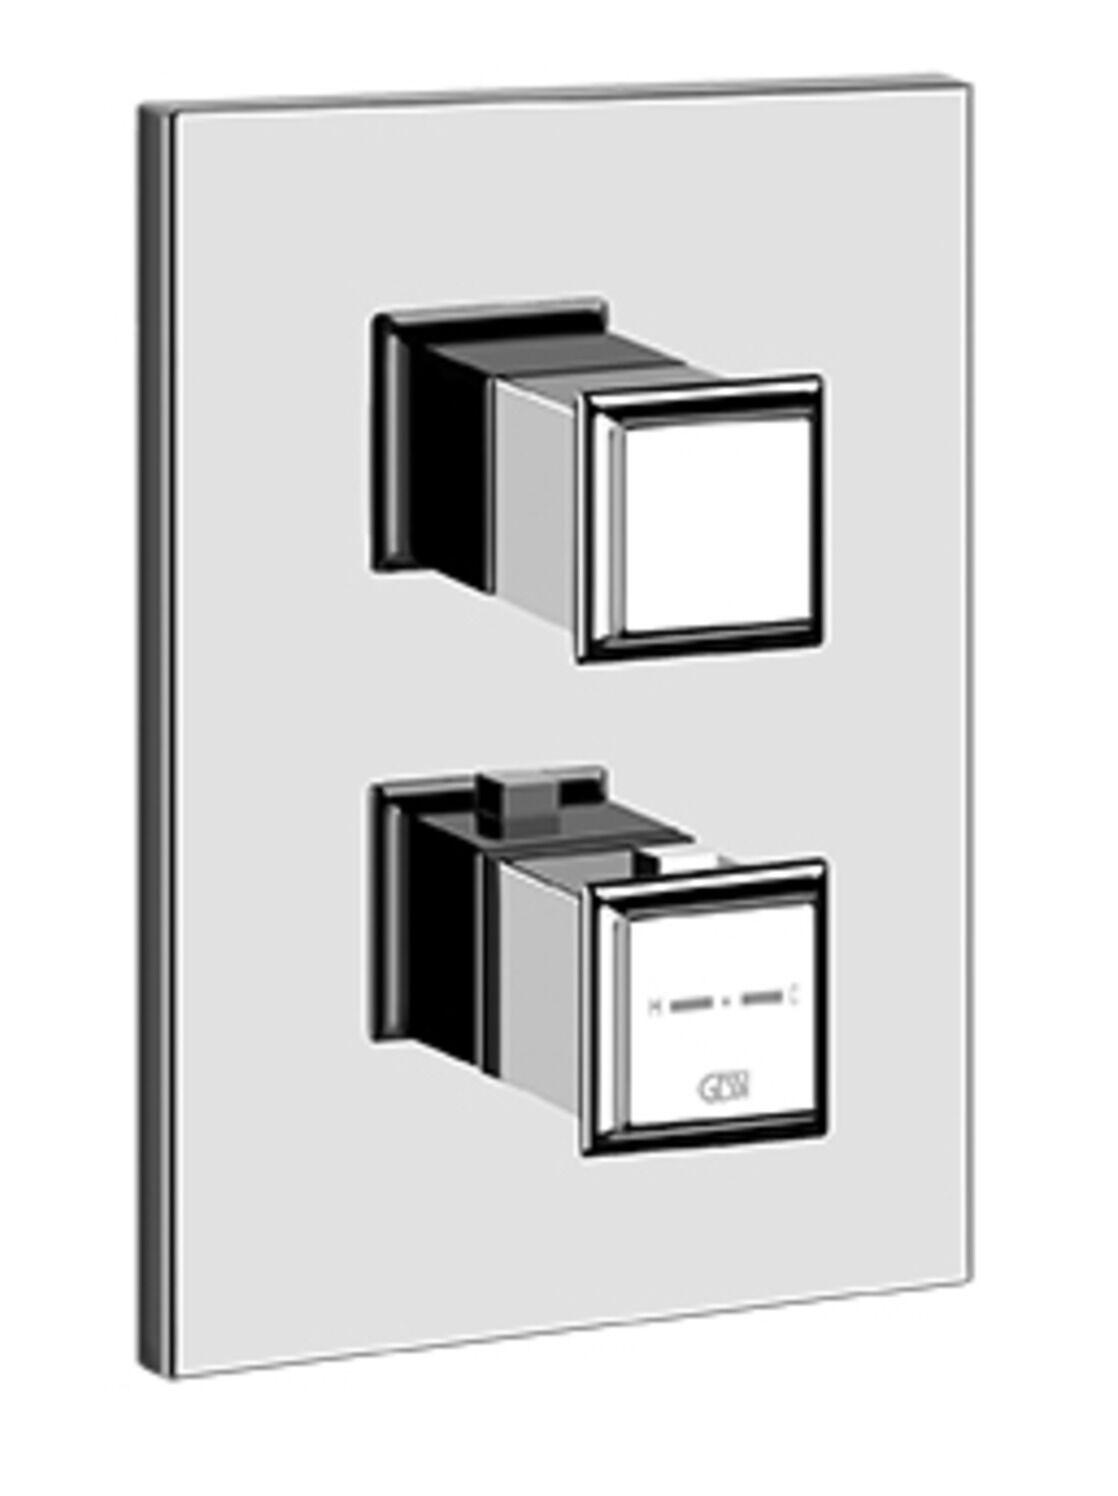 Farbset Thermostat ELEGANZA  m.2-Wege-Umstellung f.GESSIUPKTH Gessi 46234031